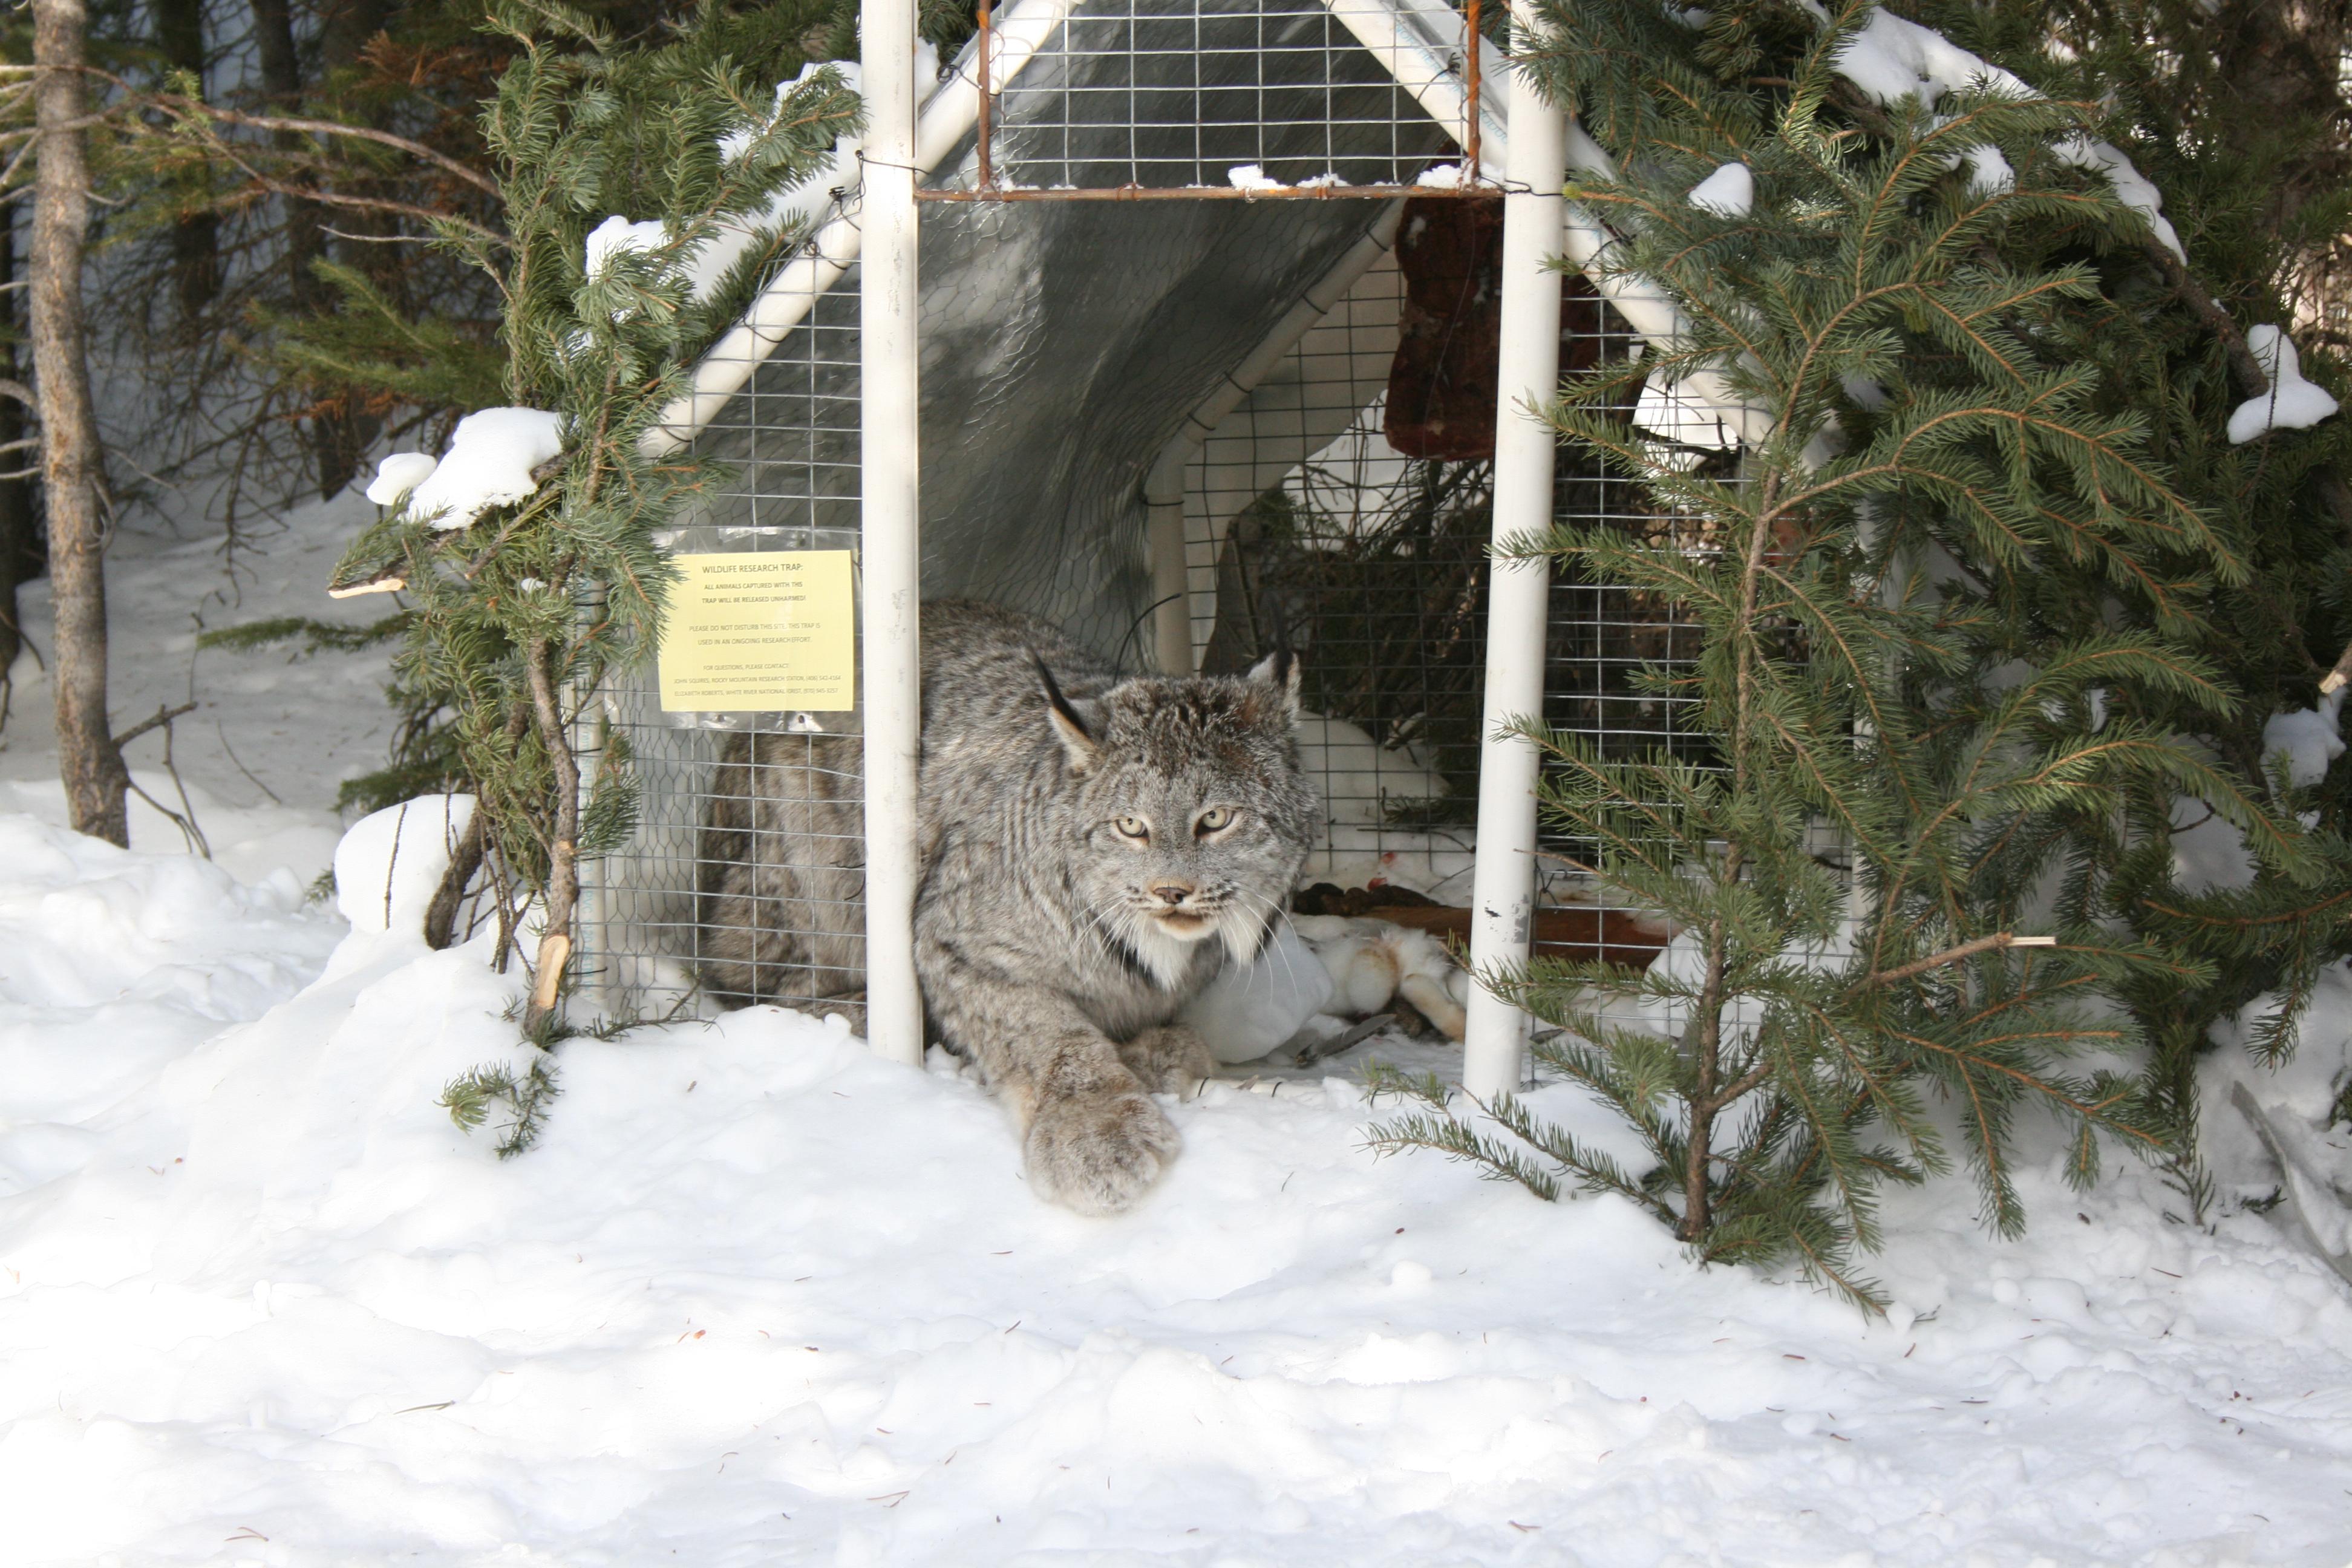 Canada lynx near Breckenridge, CO